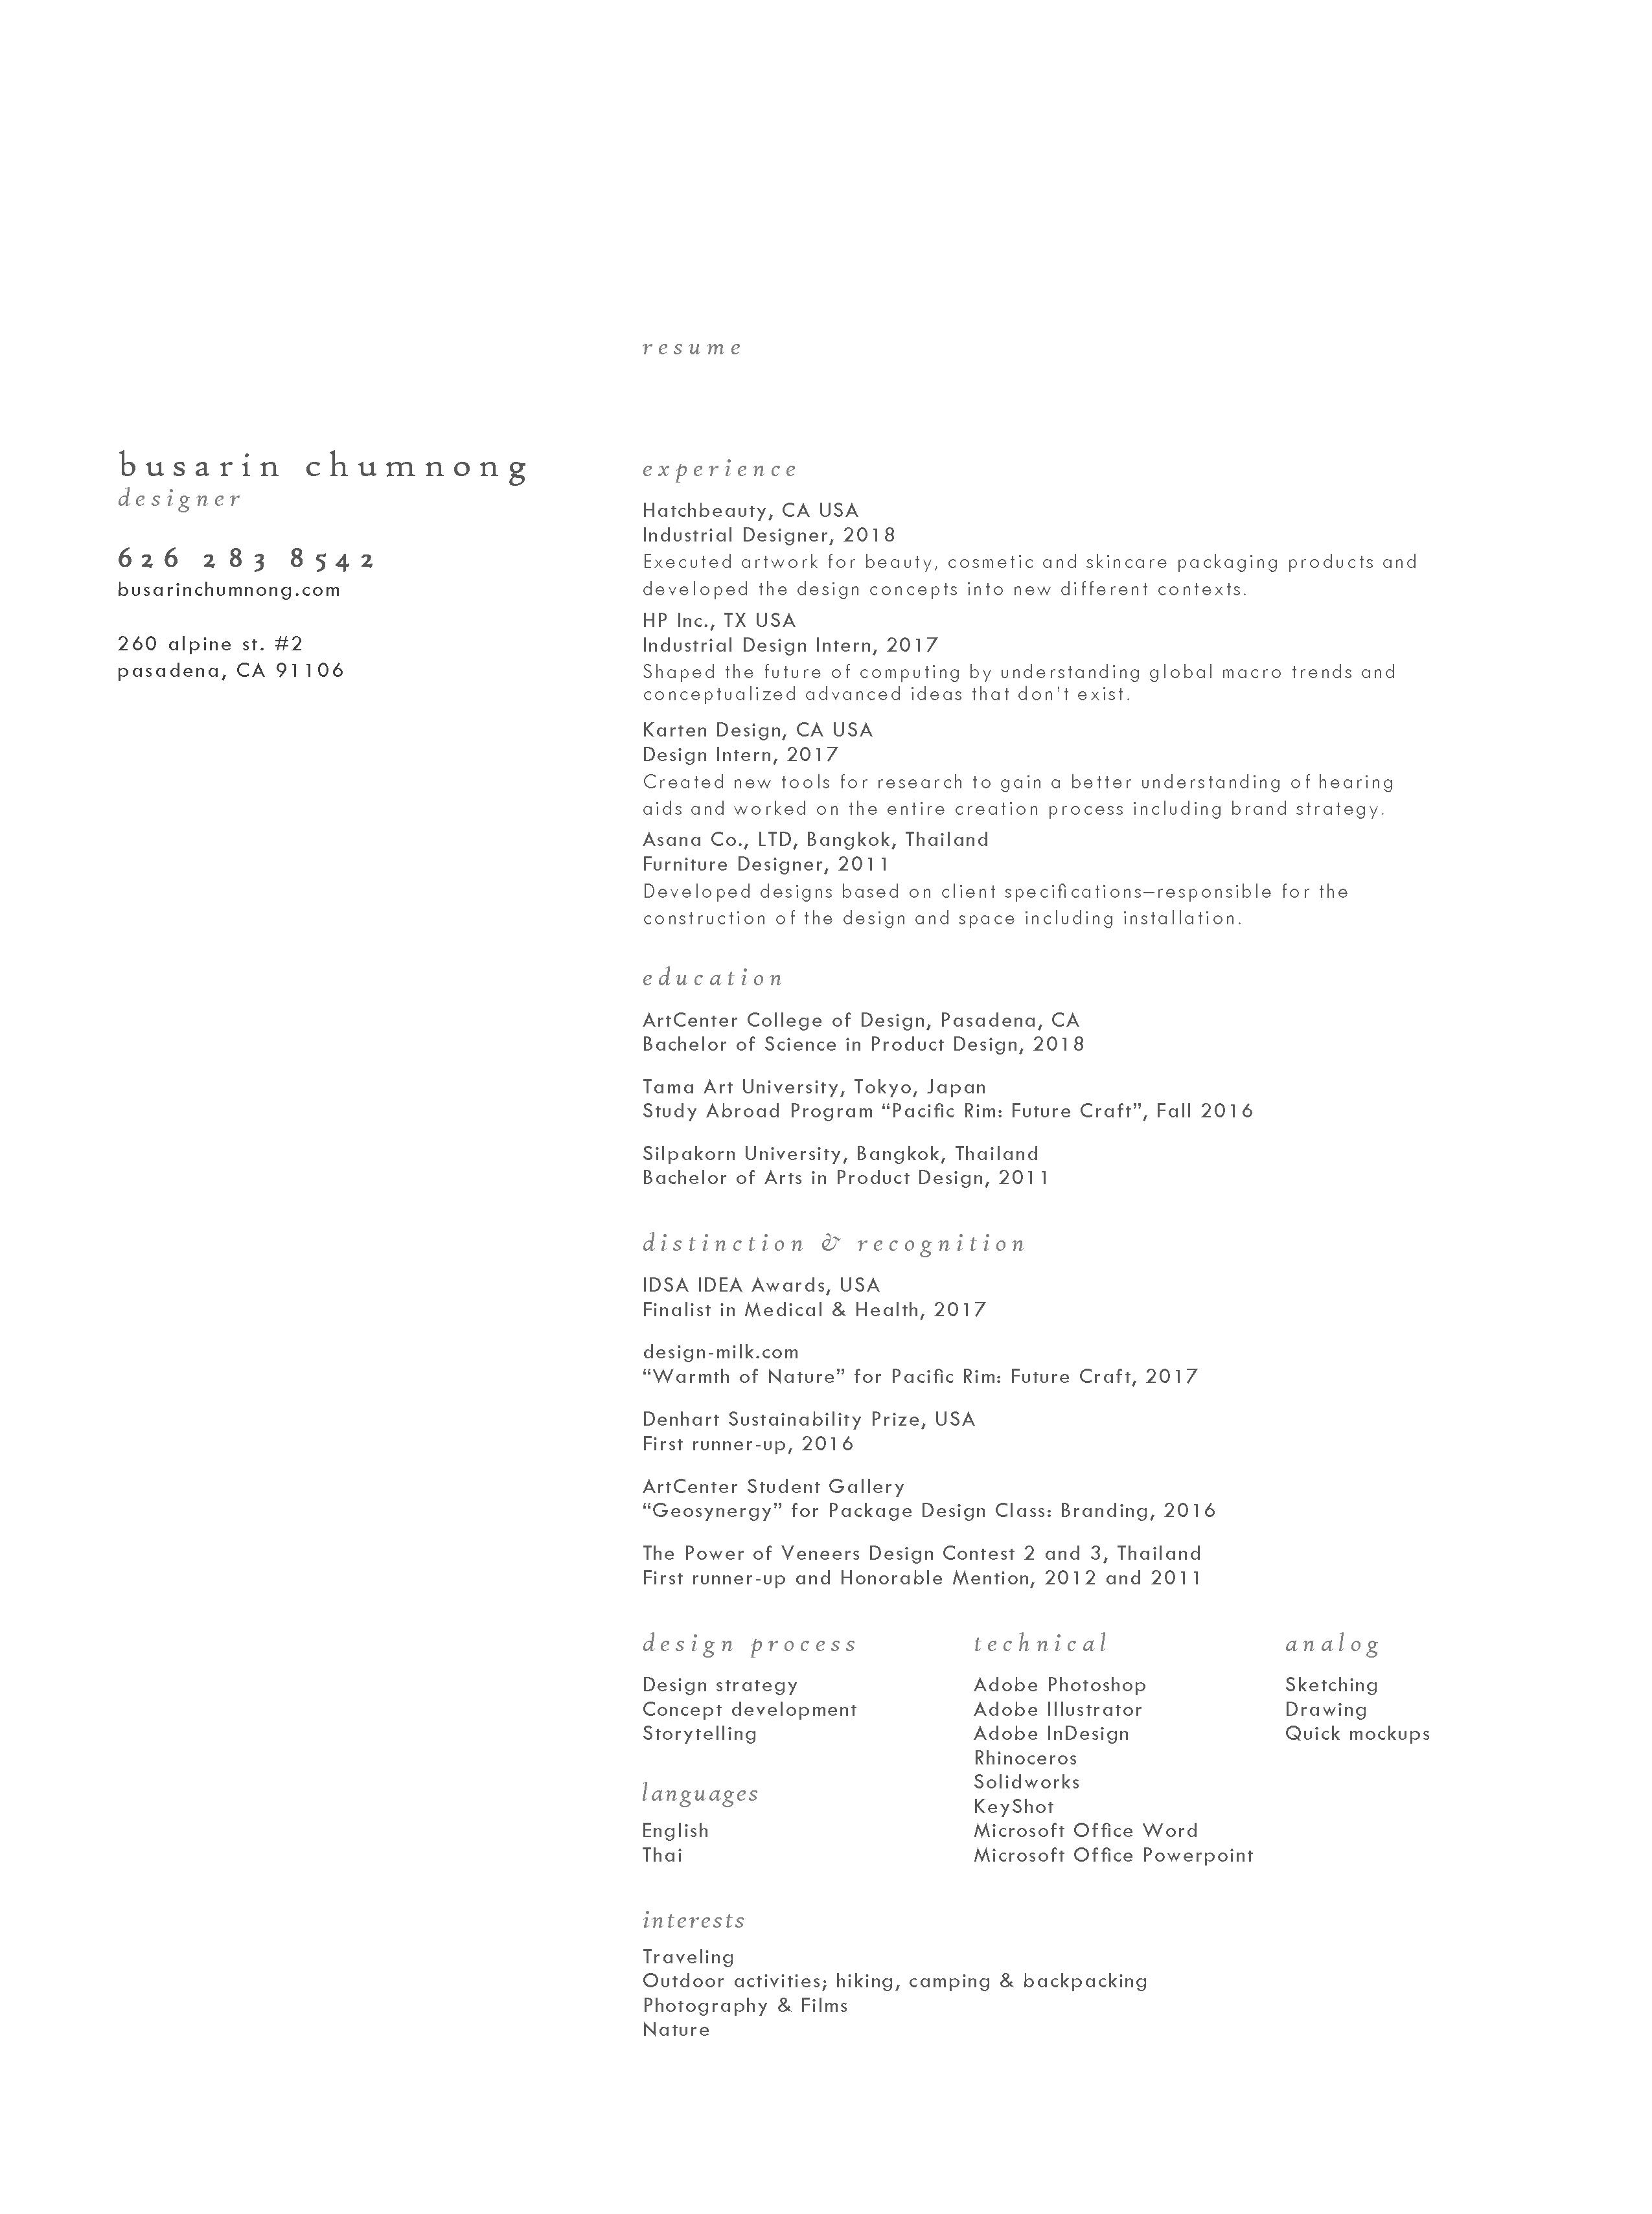 BChumnong_Resume3